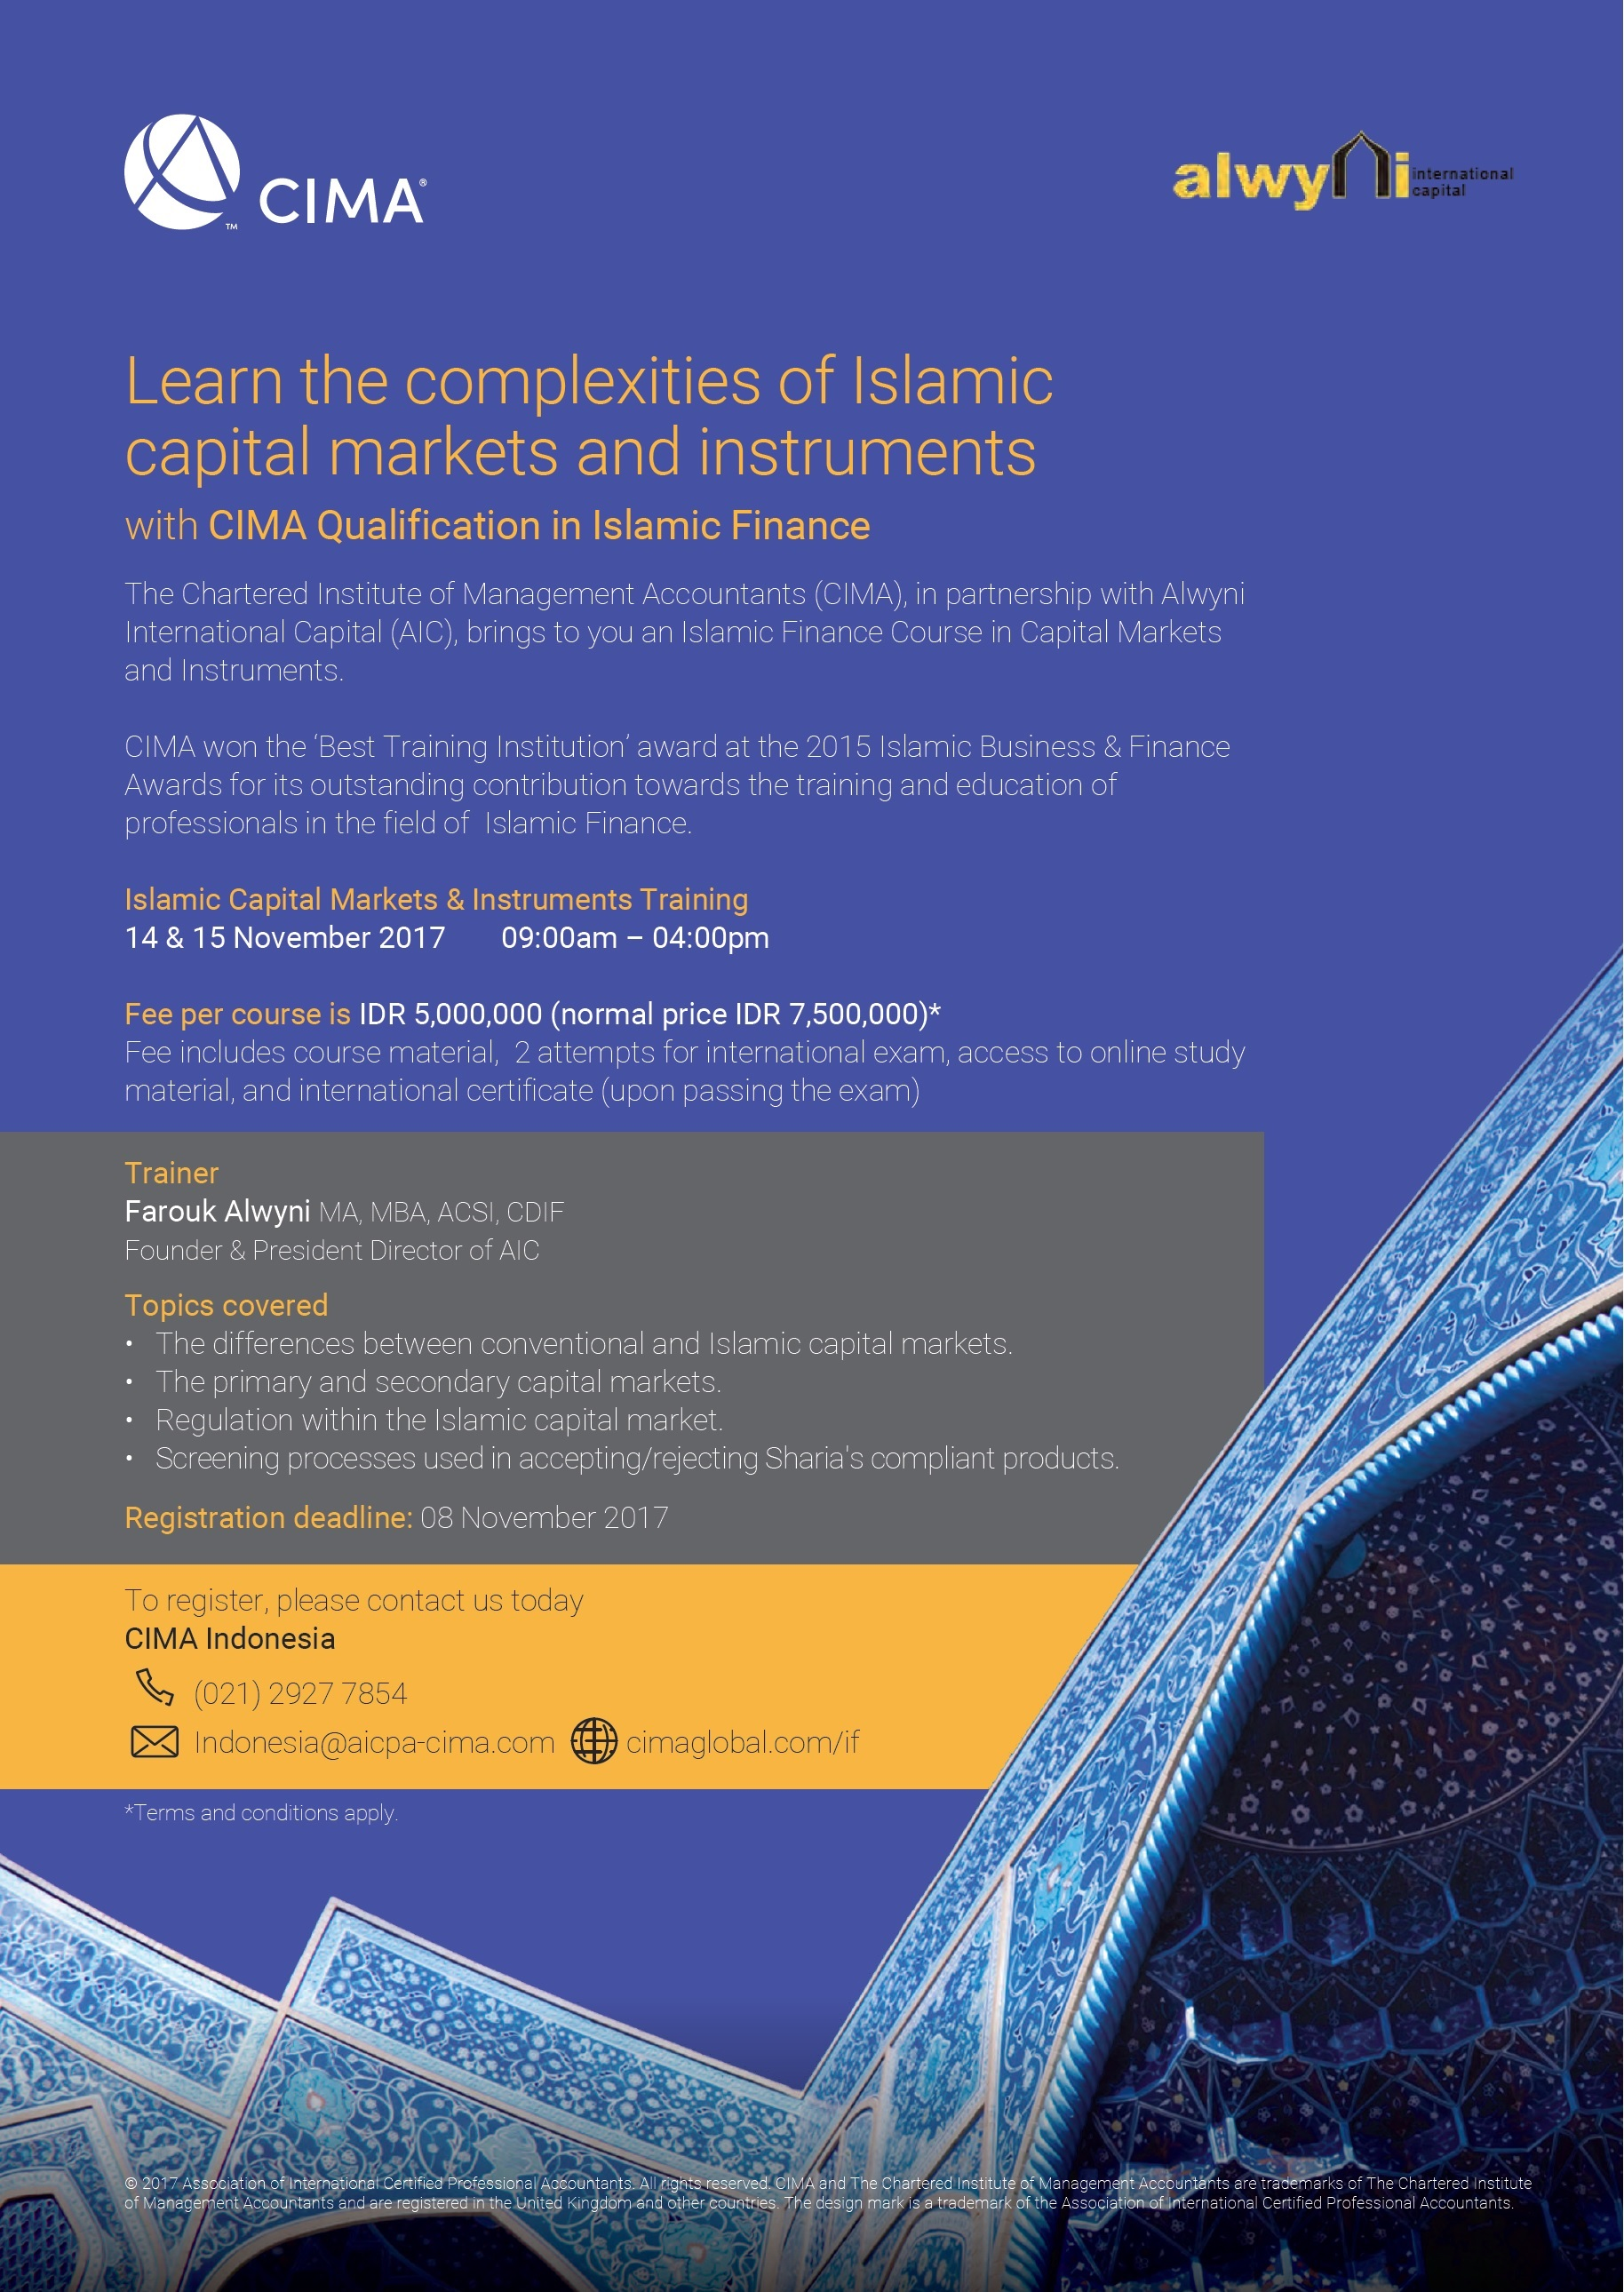 Islamic Capital Markets & Instruments